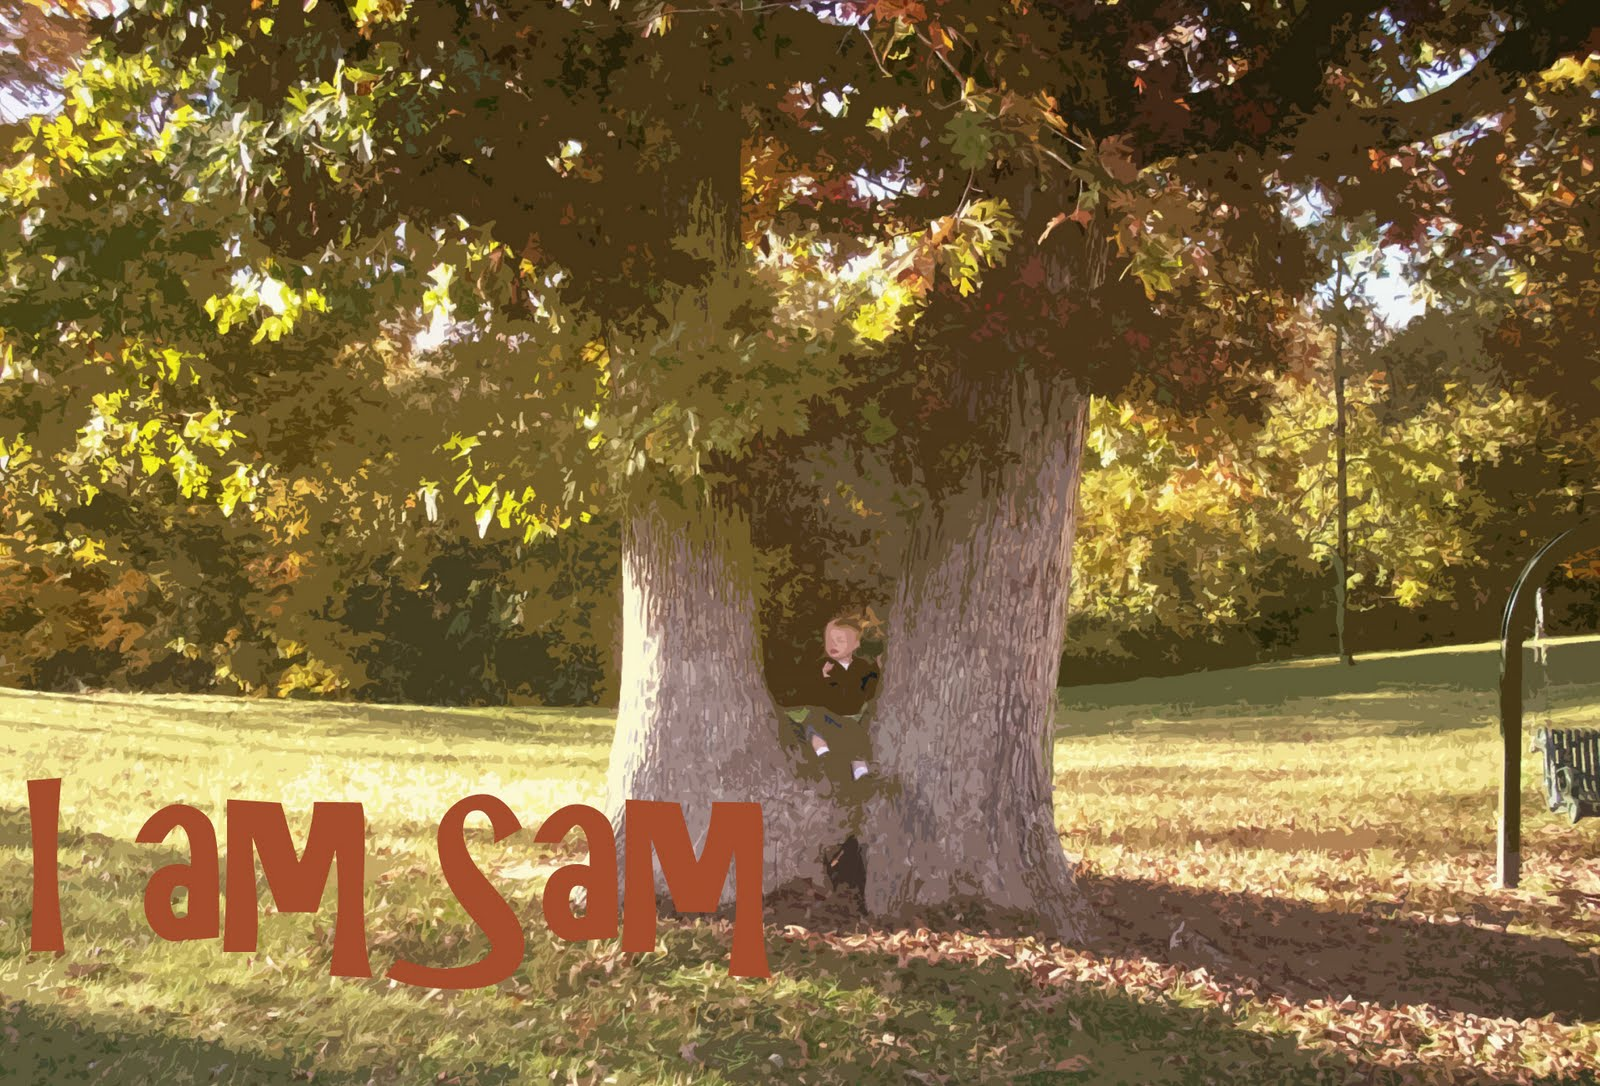 Regarding SAM